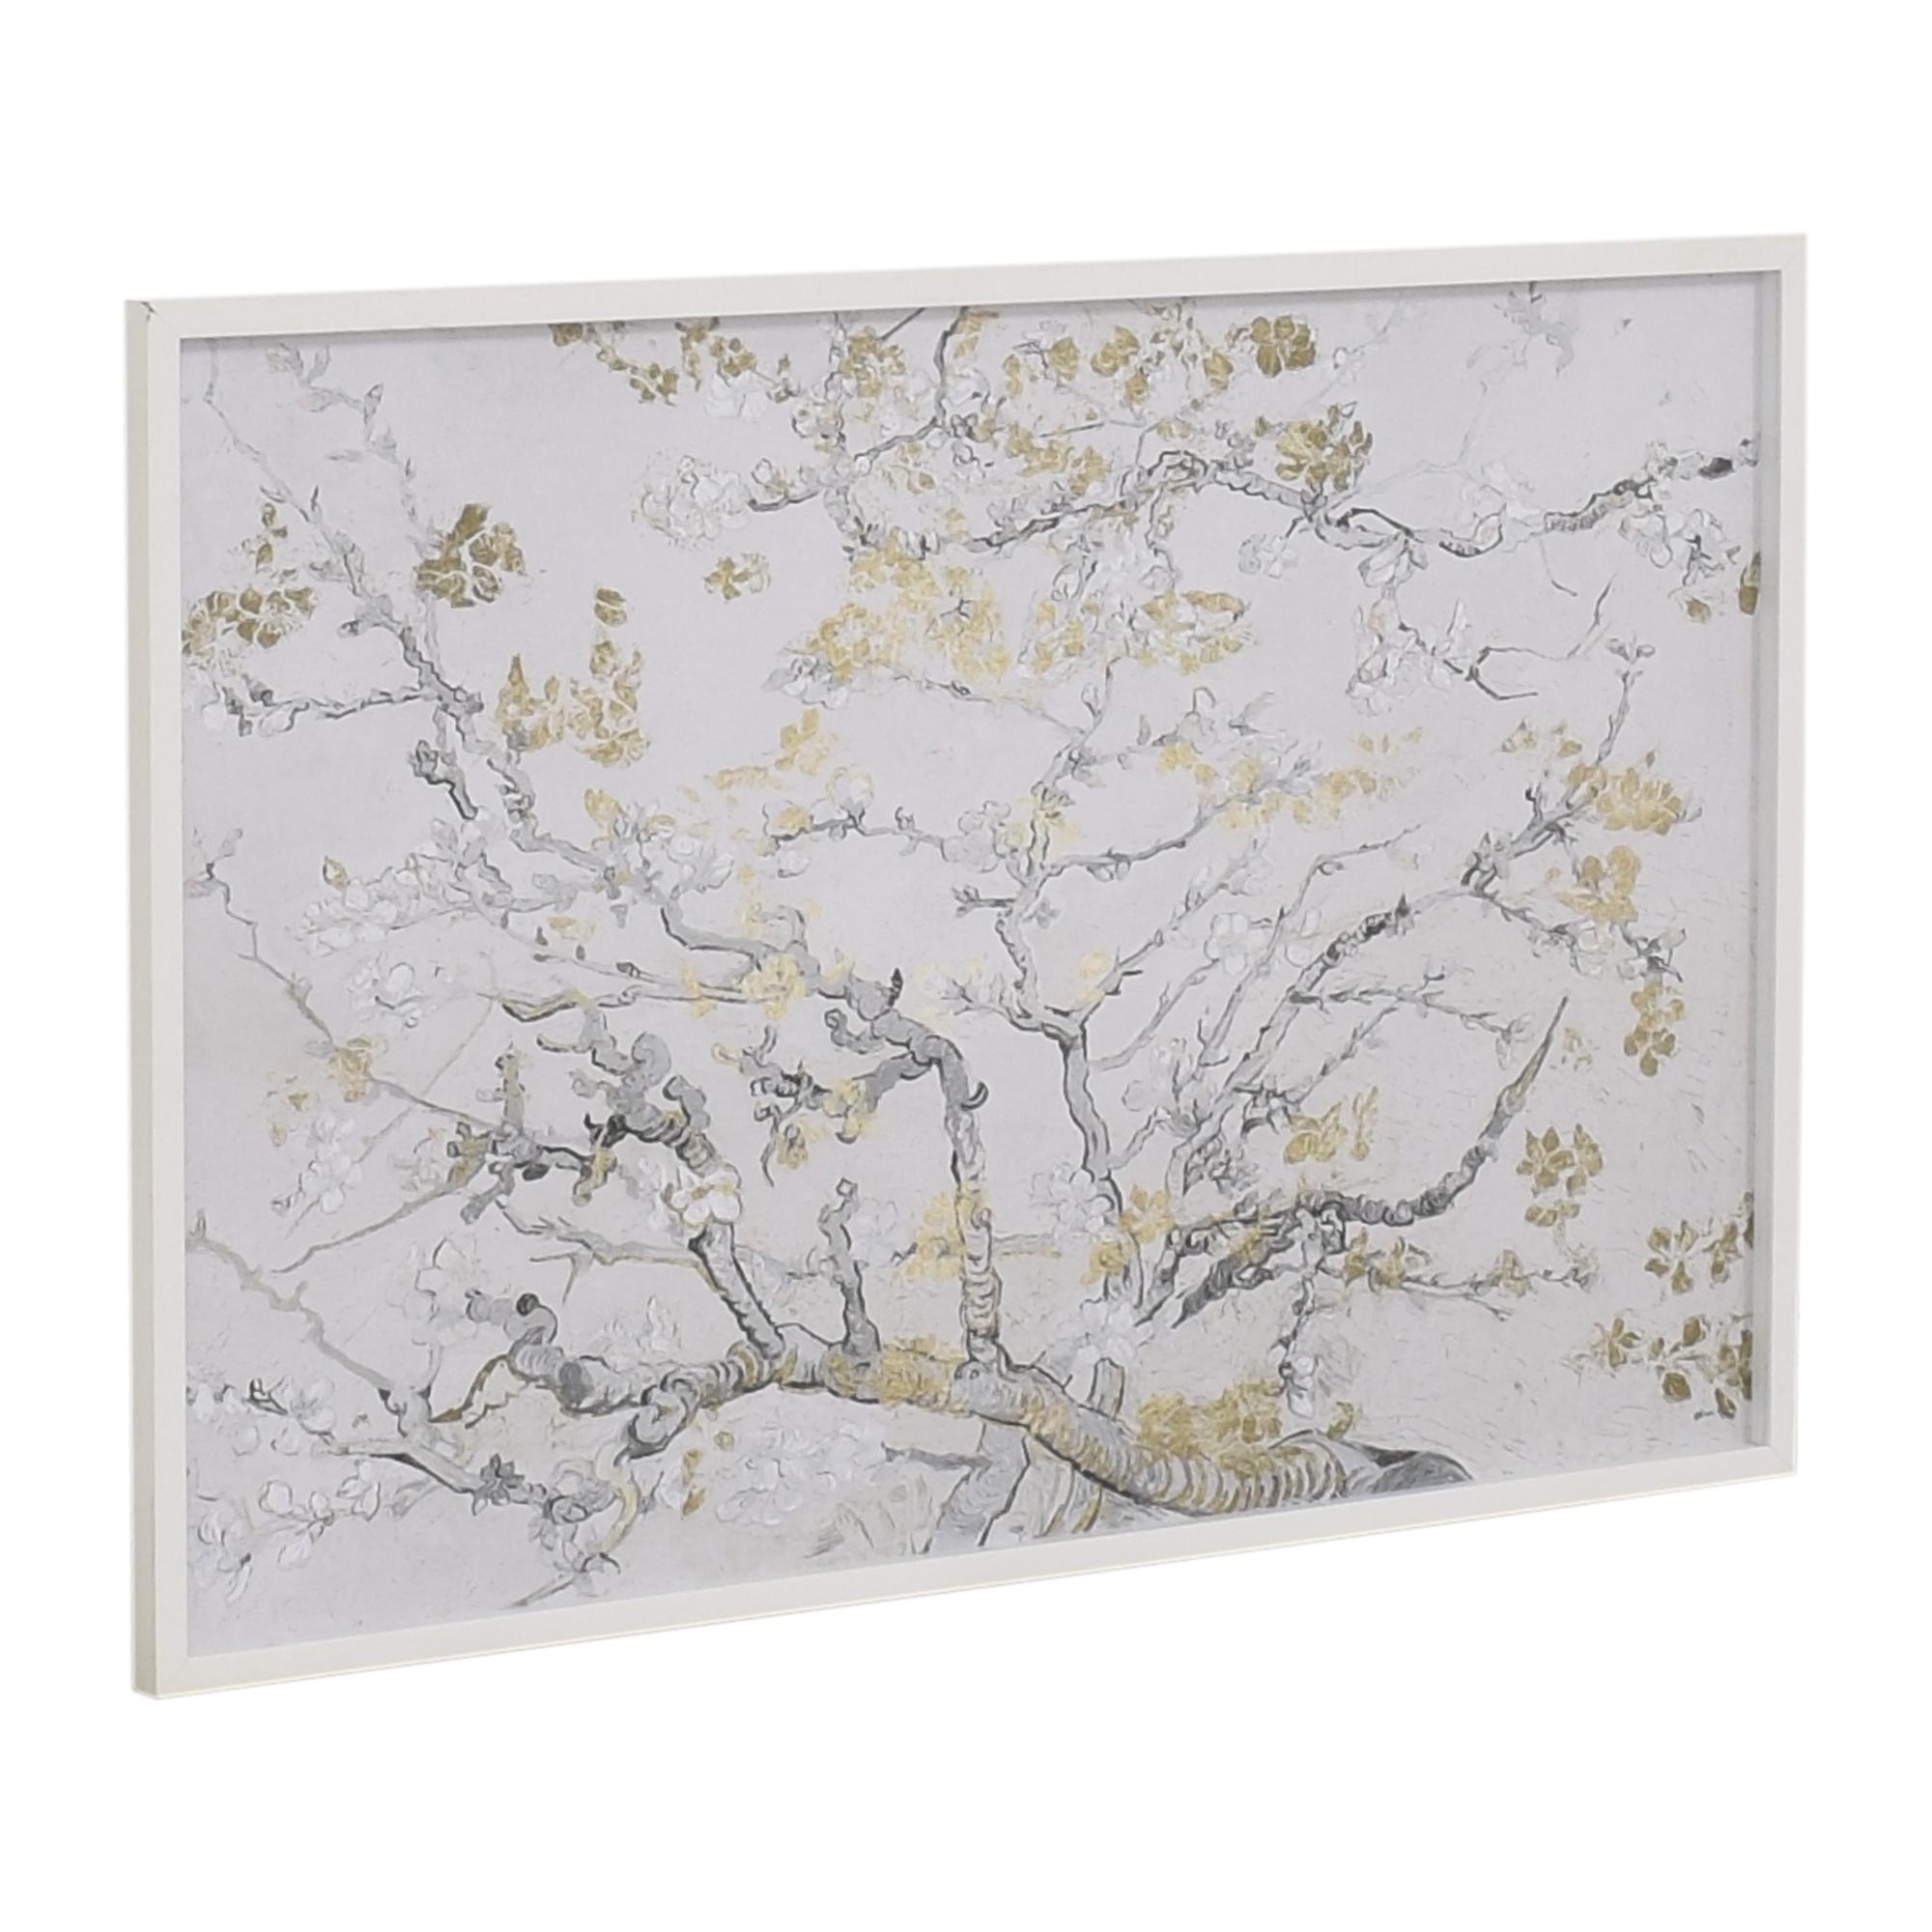 Z Gallerie Z Gallerie Vincent Van Gogh Gold Blossoms Framed Wall Art used